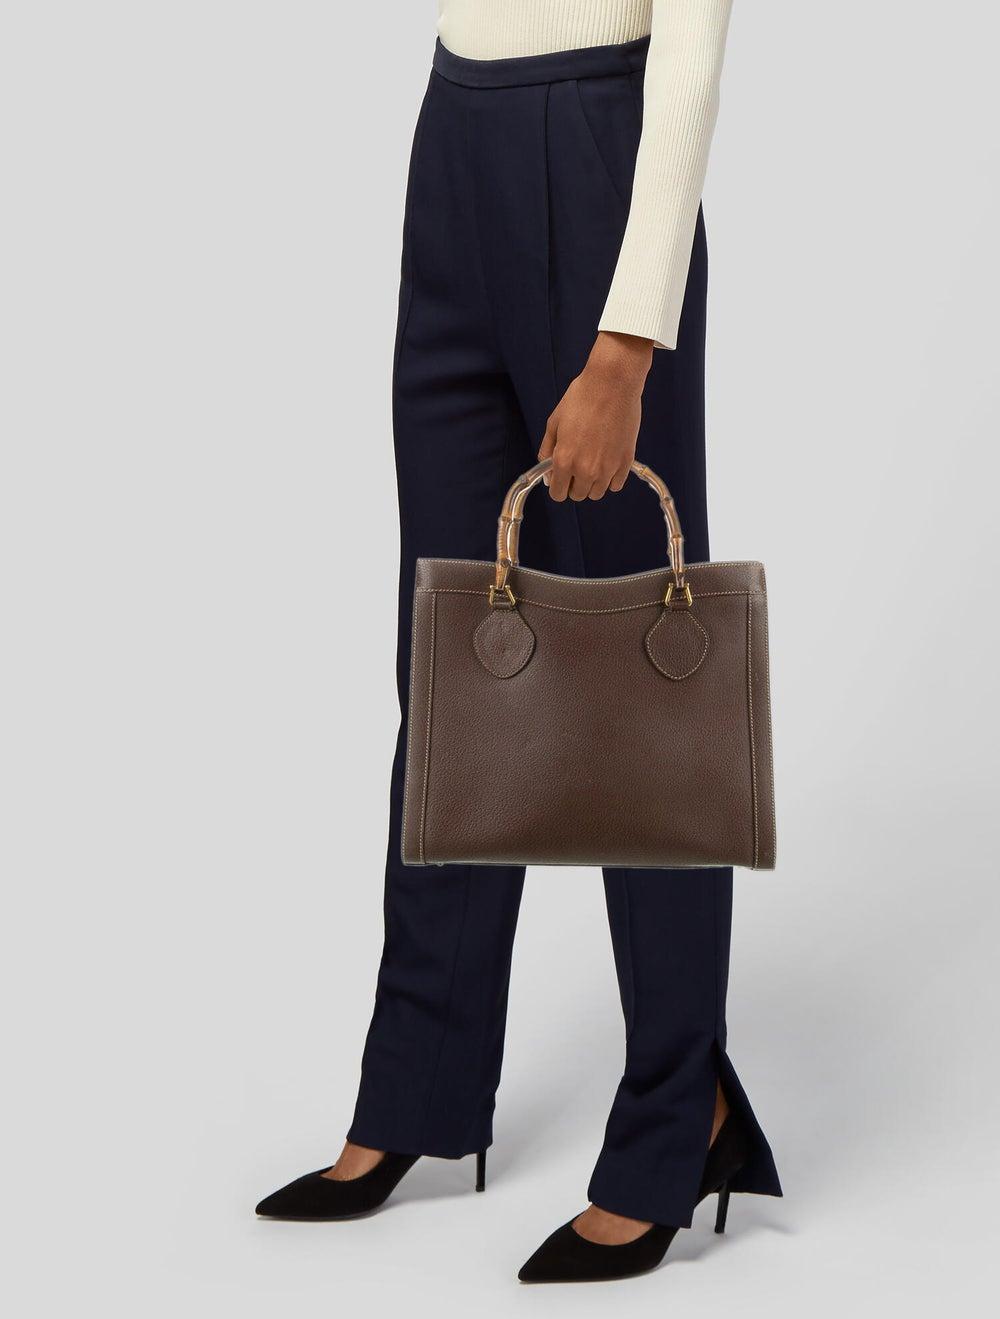 Gucci Vintage Diana Bamboo Tote Brown - image 2